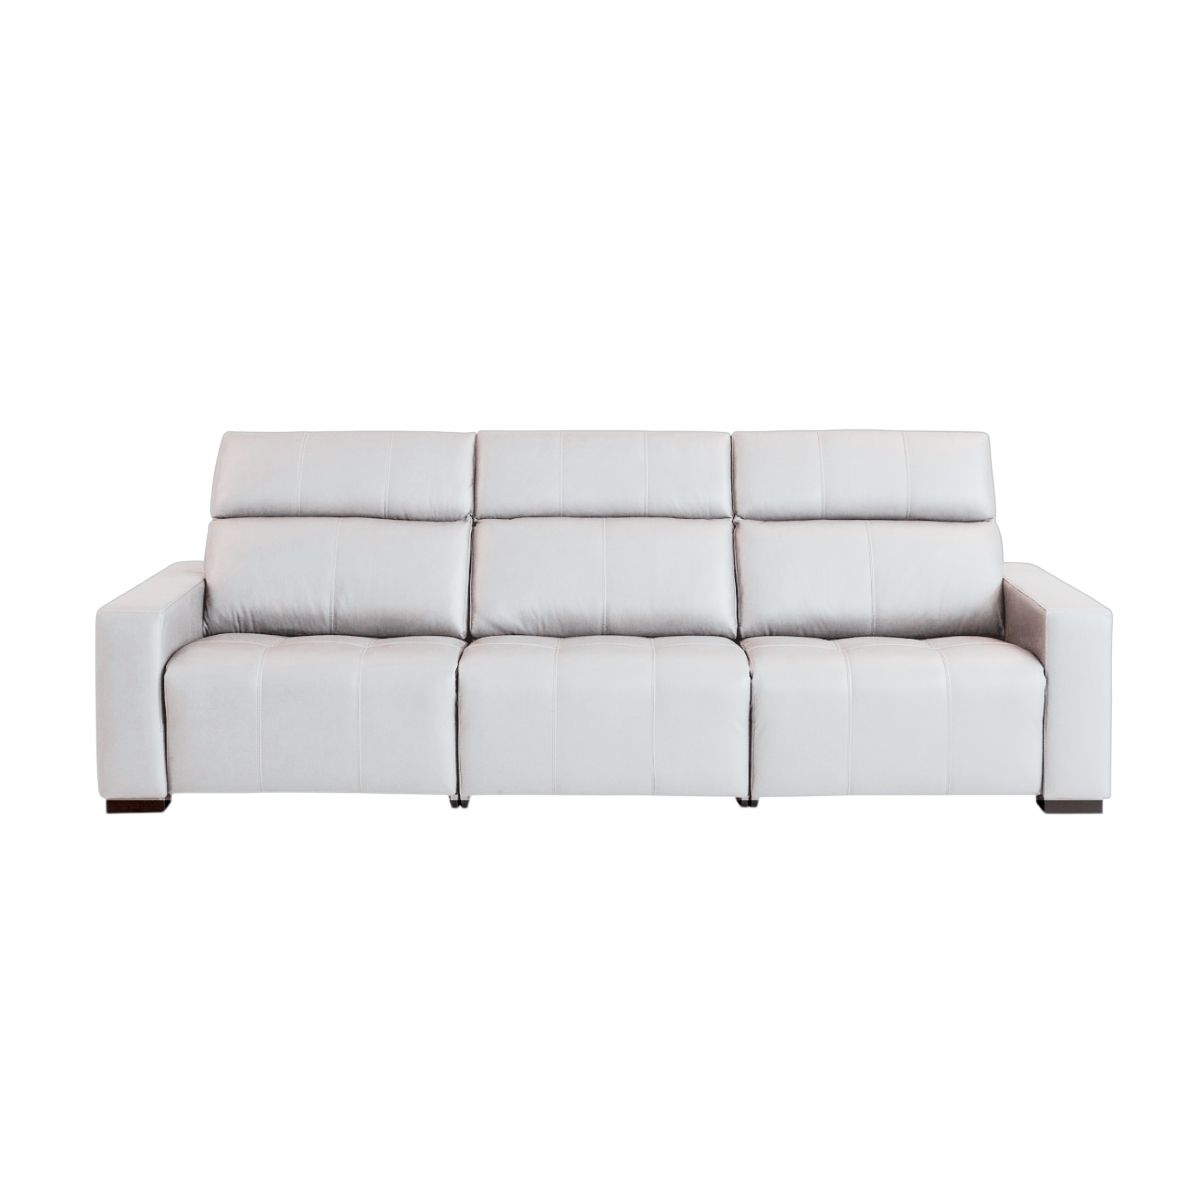 Sofá Retrátil Elétrico de Couro 289cm - Malta Off White